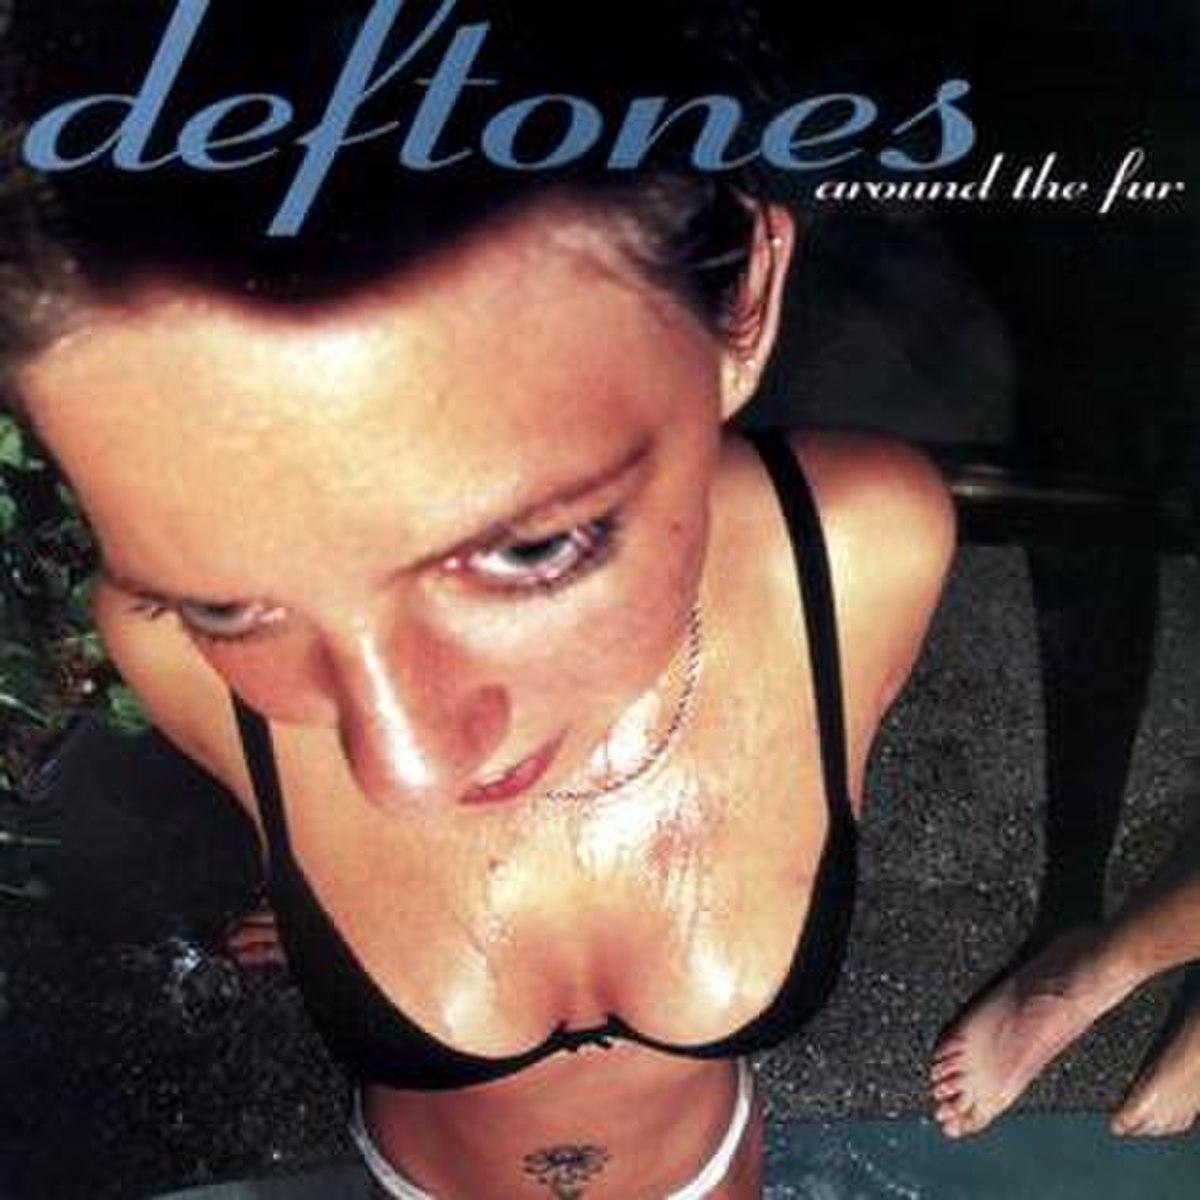 1200px-Deftones_-_Around_the_Fur.jpg